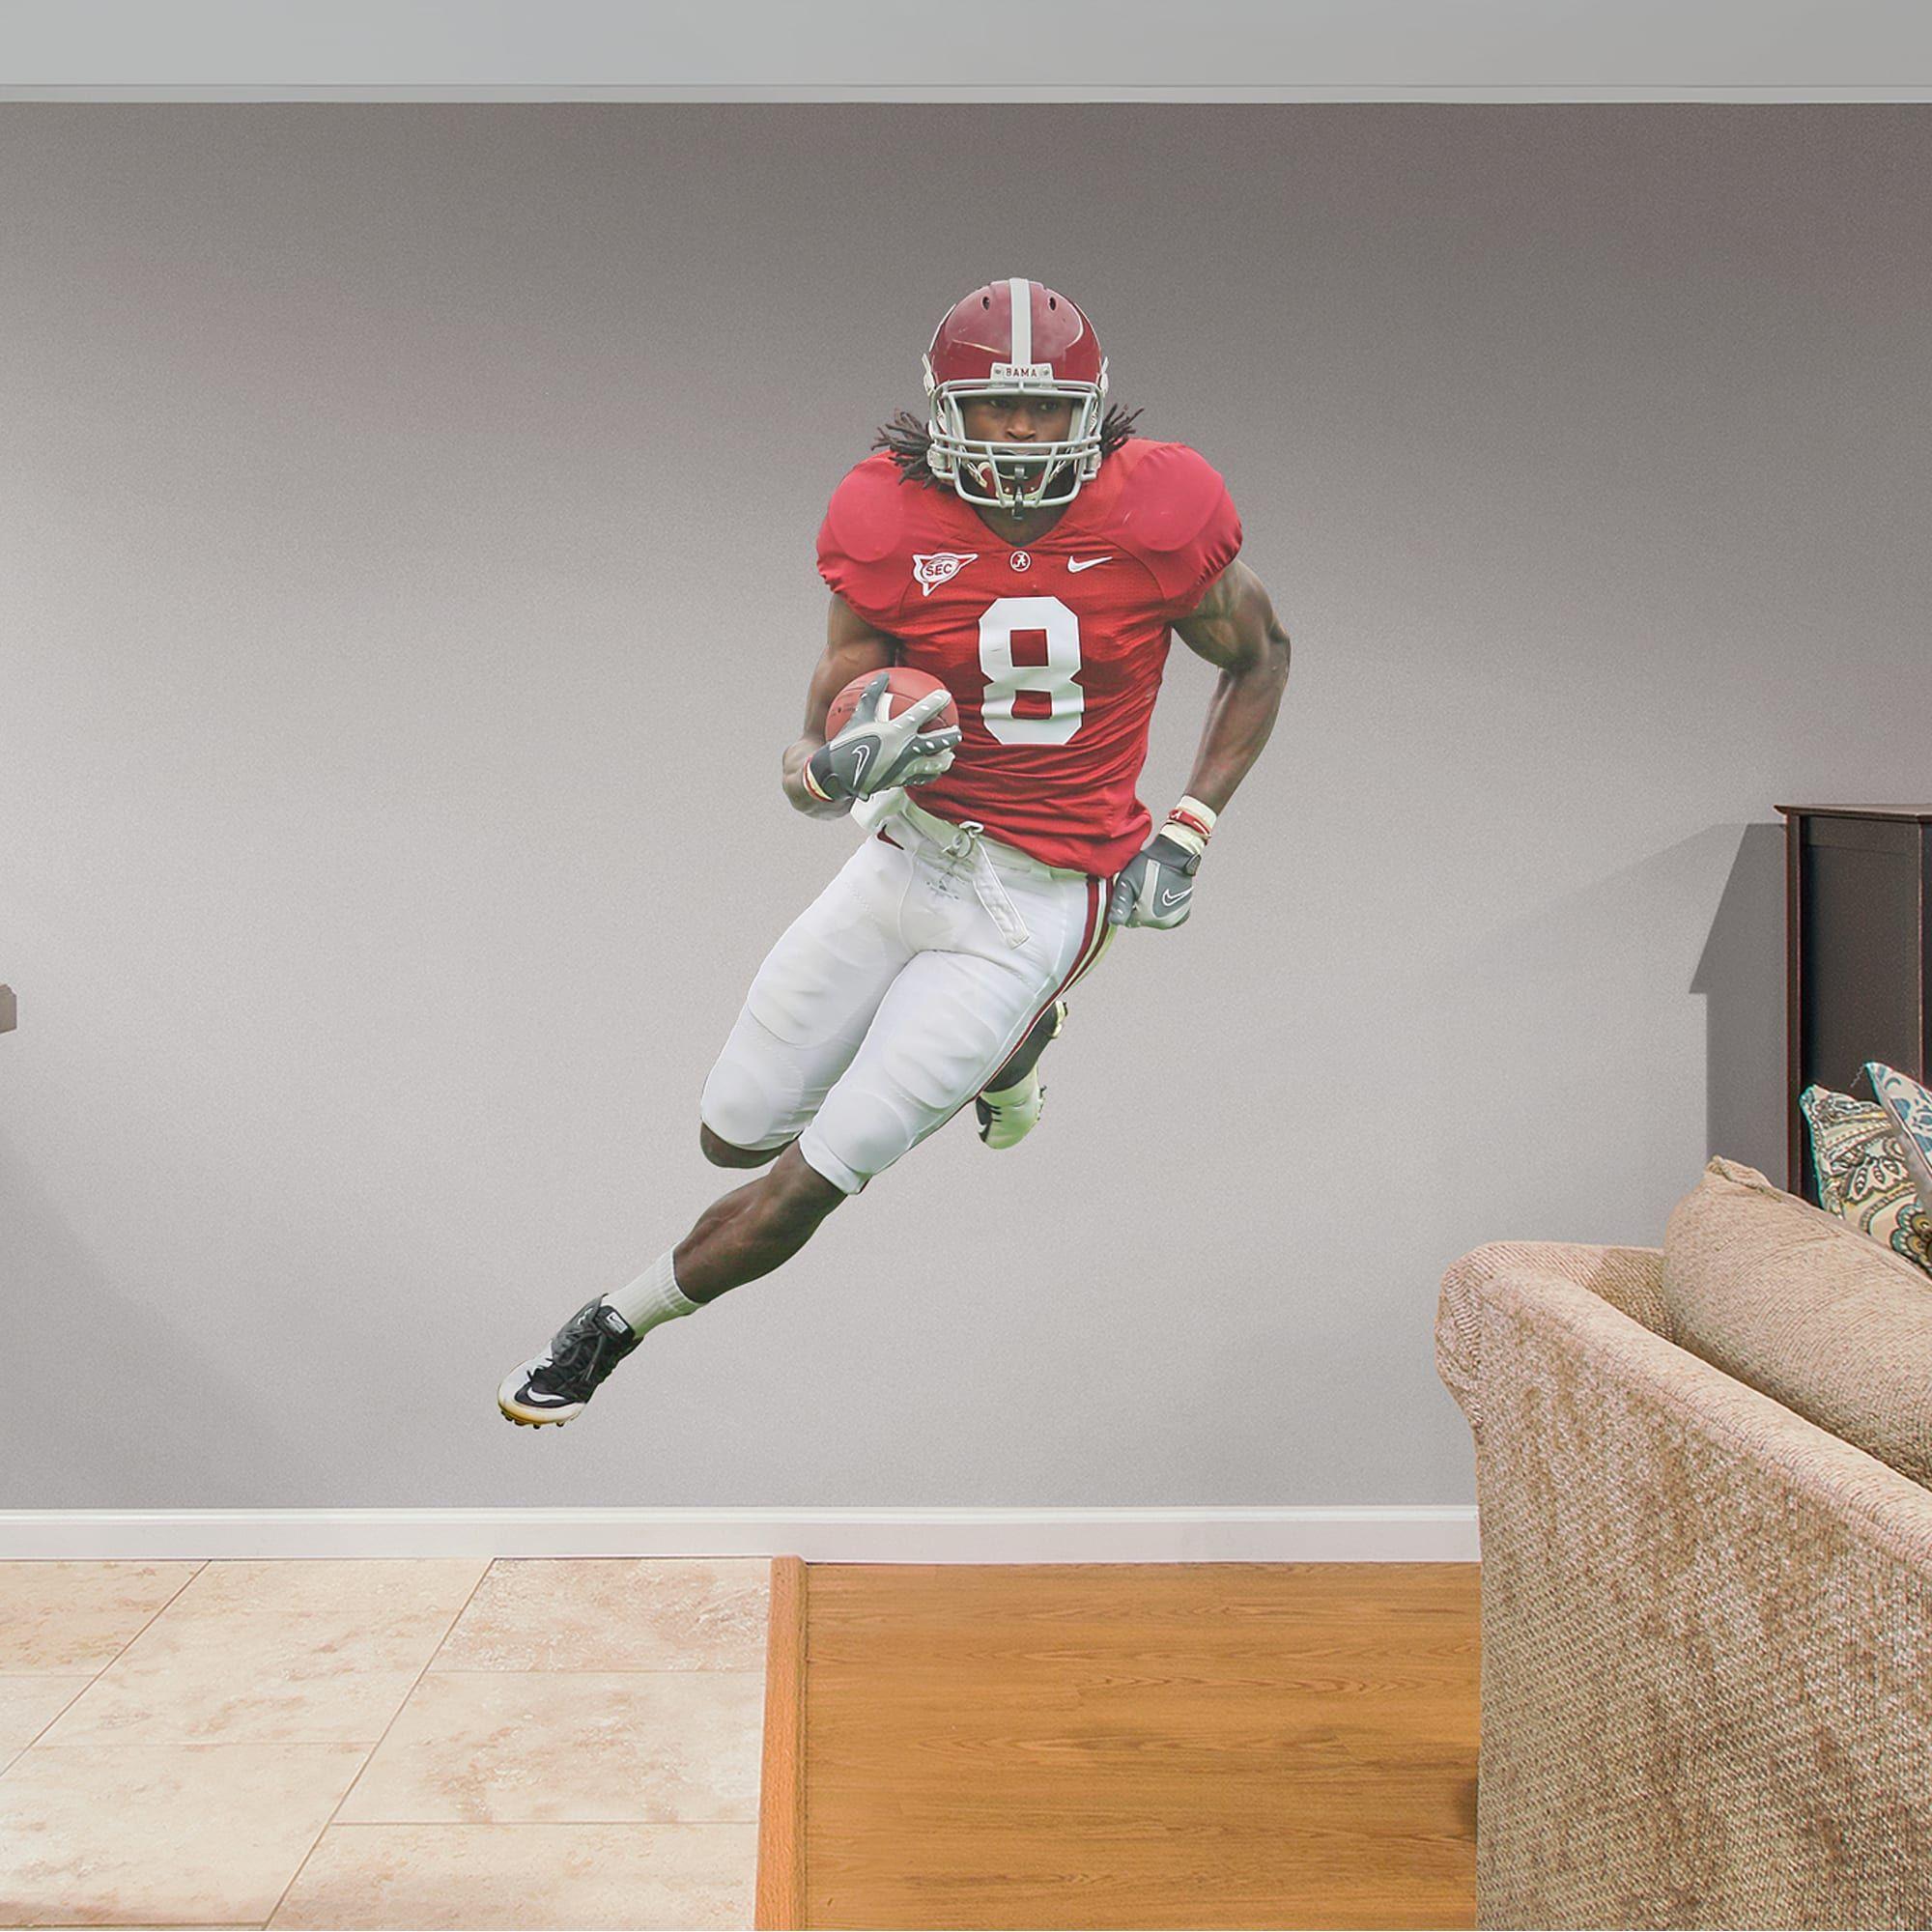 Julio Jones Alabama Life Size Officially Licensed Removable Wall Decal Removable Wall Decals Alabama Crimson Tide Football Bedroom